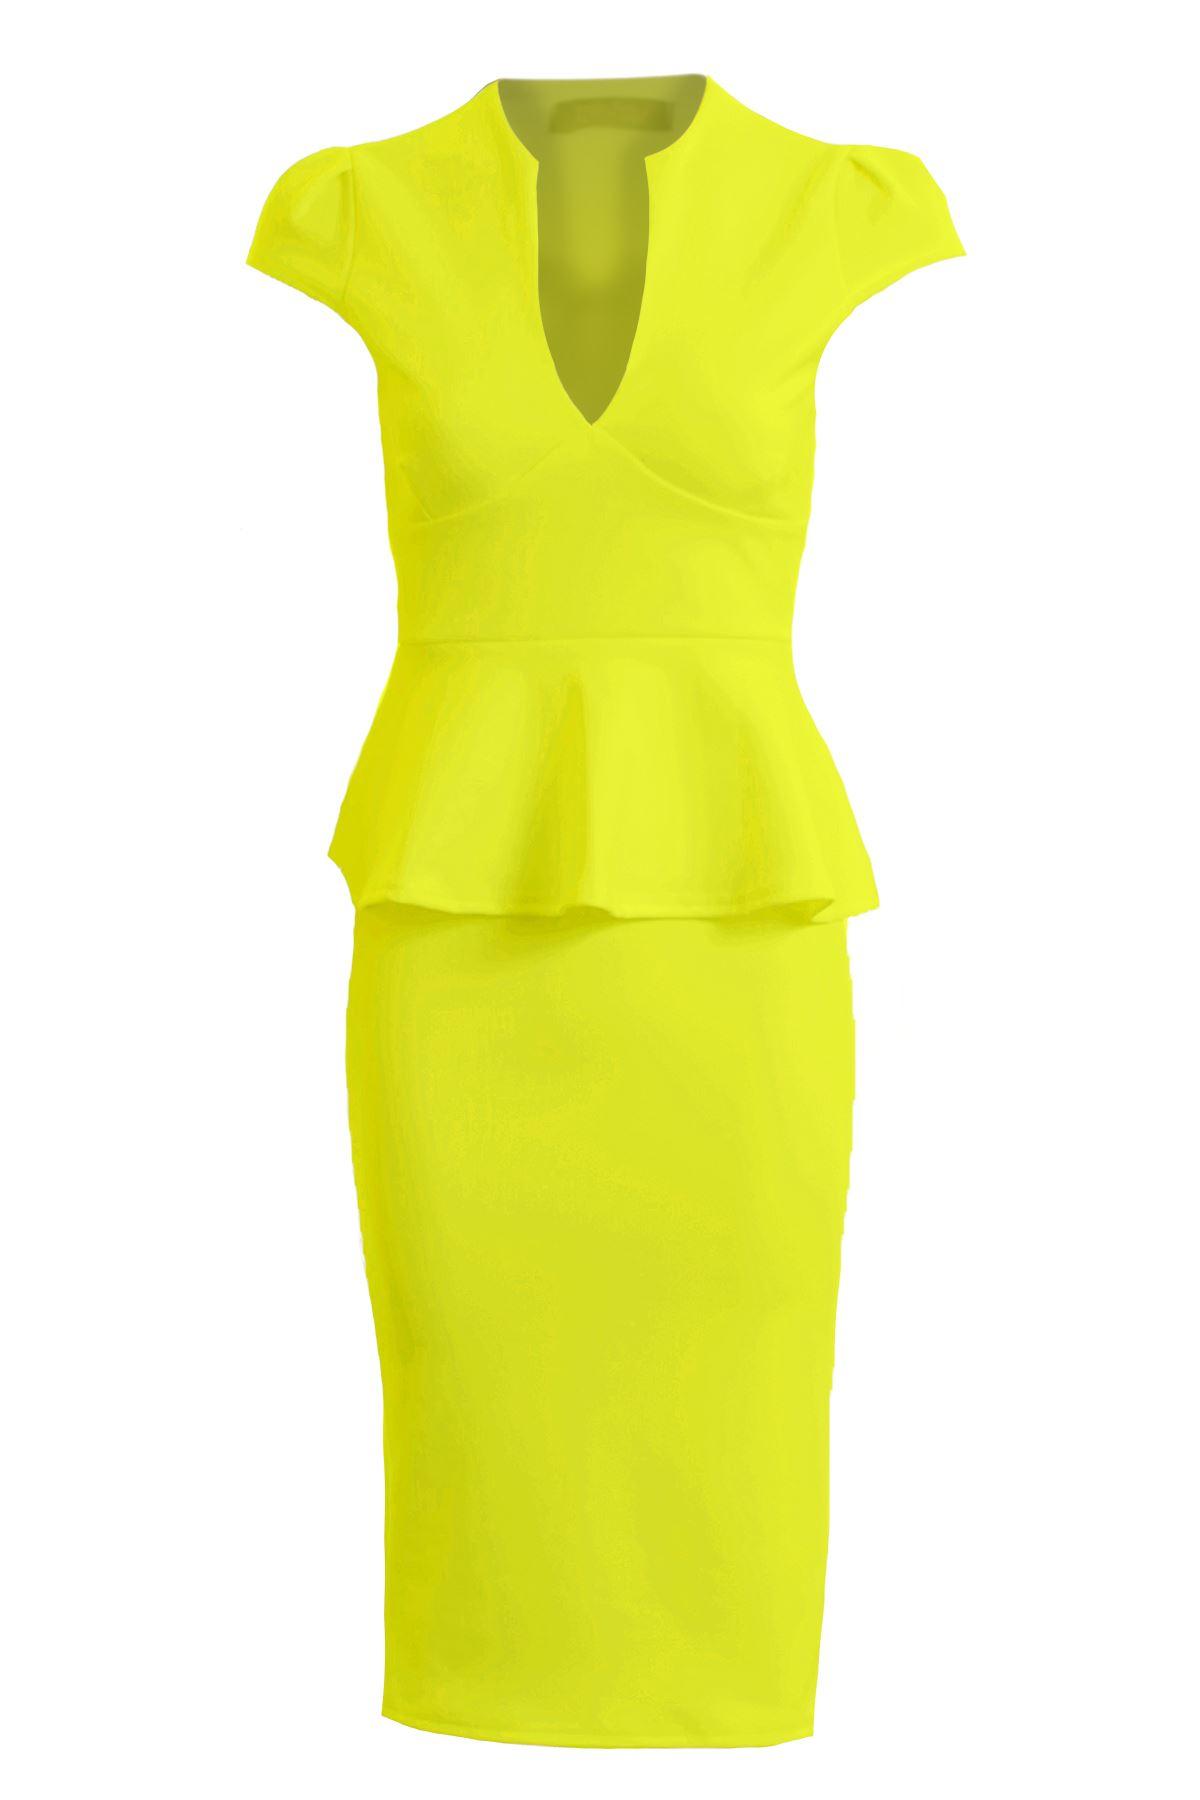 Womens Cap Sleeve Plunge V Neck Knee Length Peplum Frill Midi Bodycon Dress